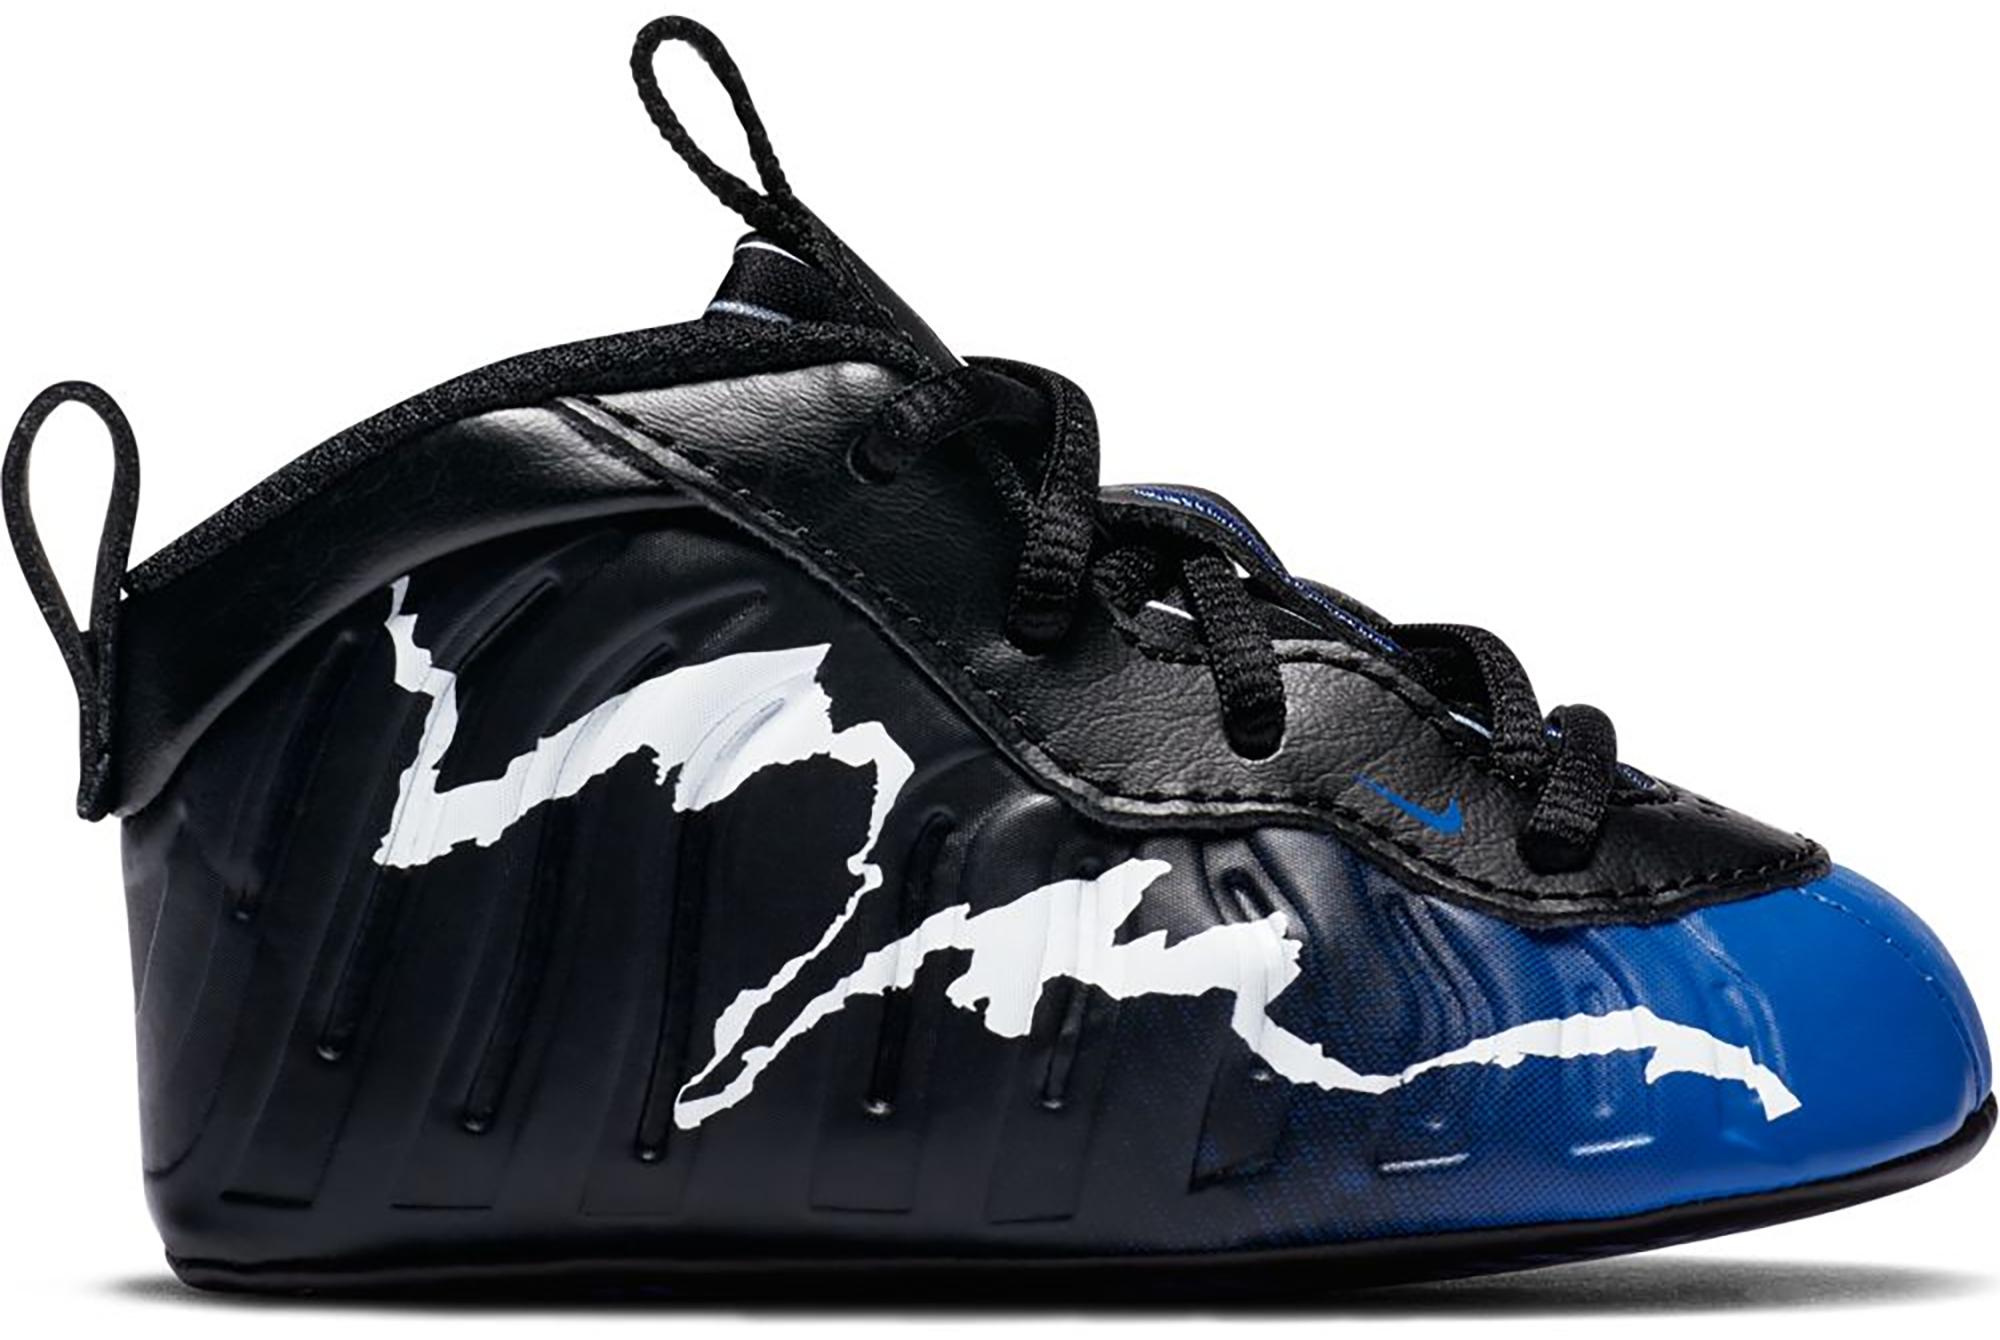 Supreme x Nike Air Foamposite One Pack SBD